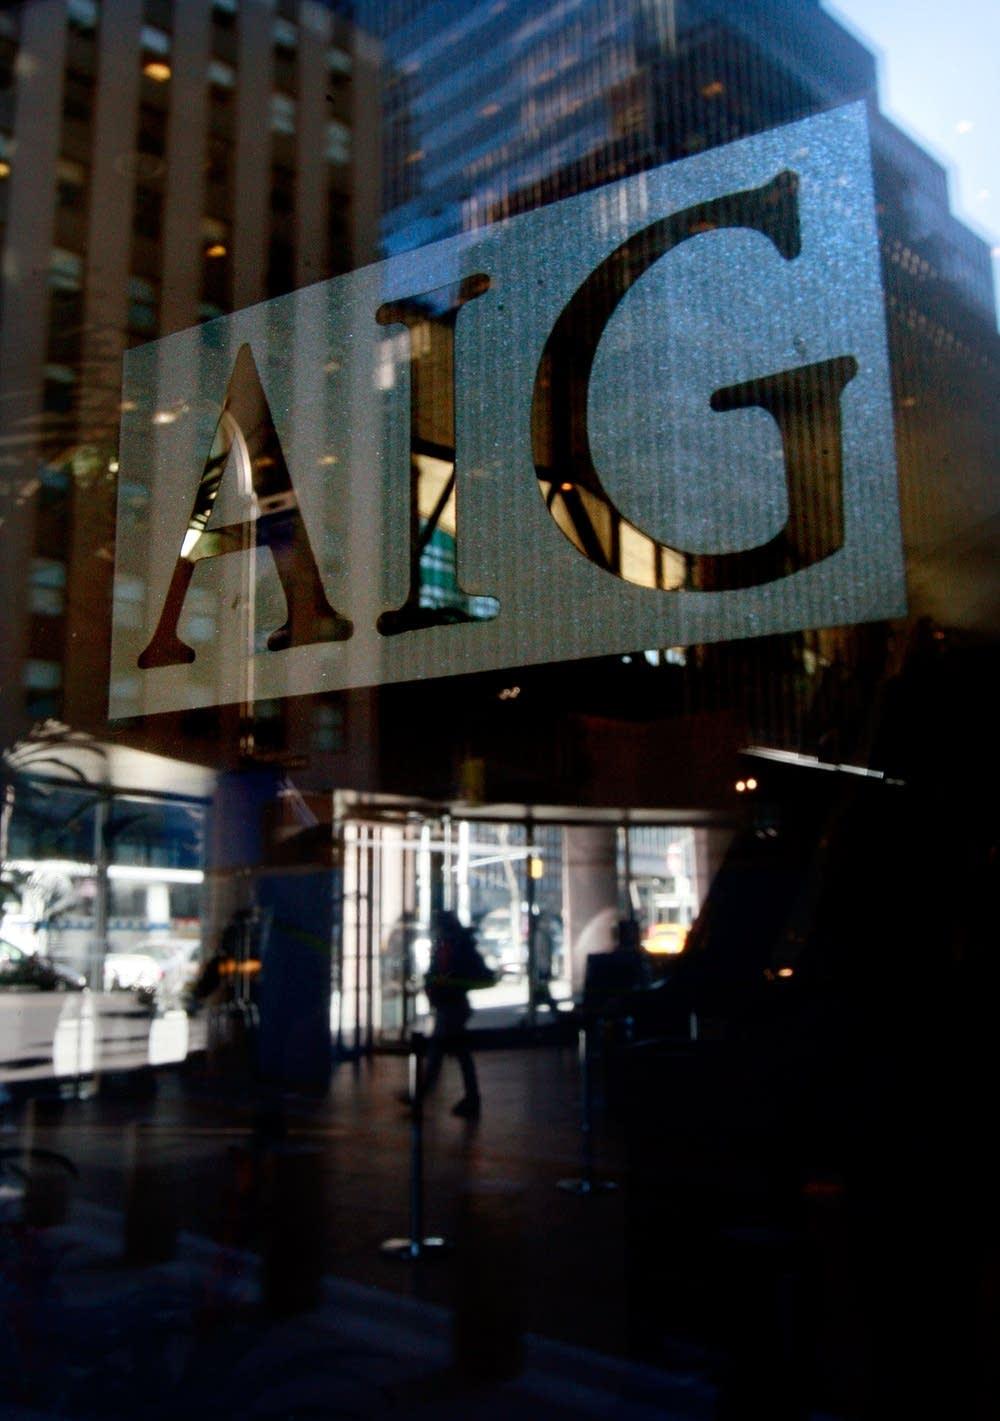 Outrage over AIG bonuses